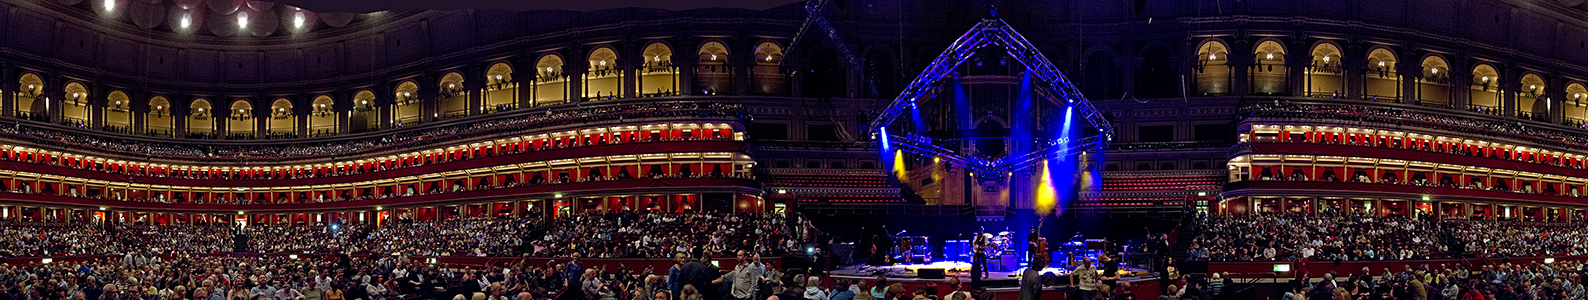 Royal Albert Hall (vor dem Mark Knopfler-Konzert) London